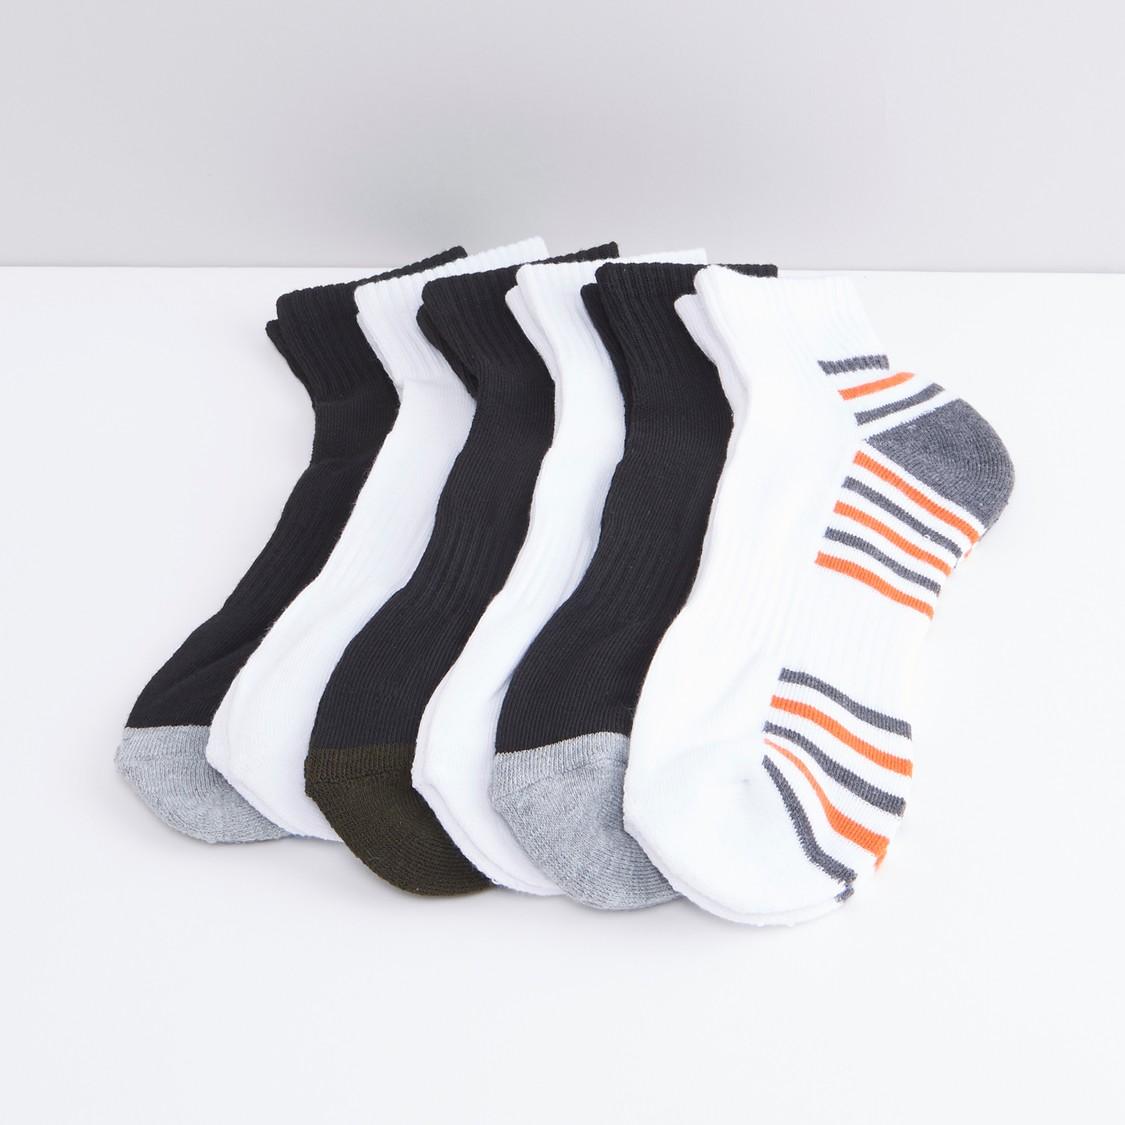 Set of 5 Striped Ankle Length Socks